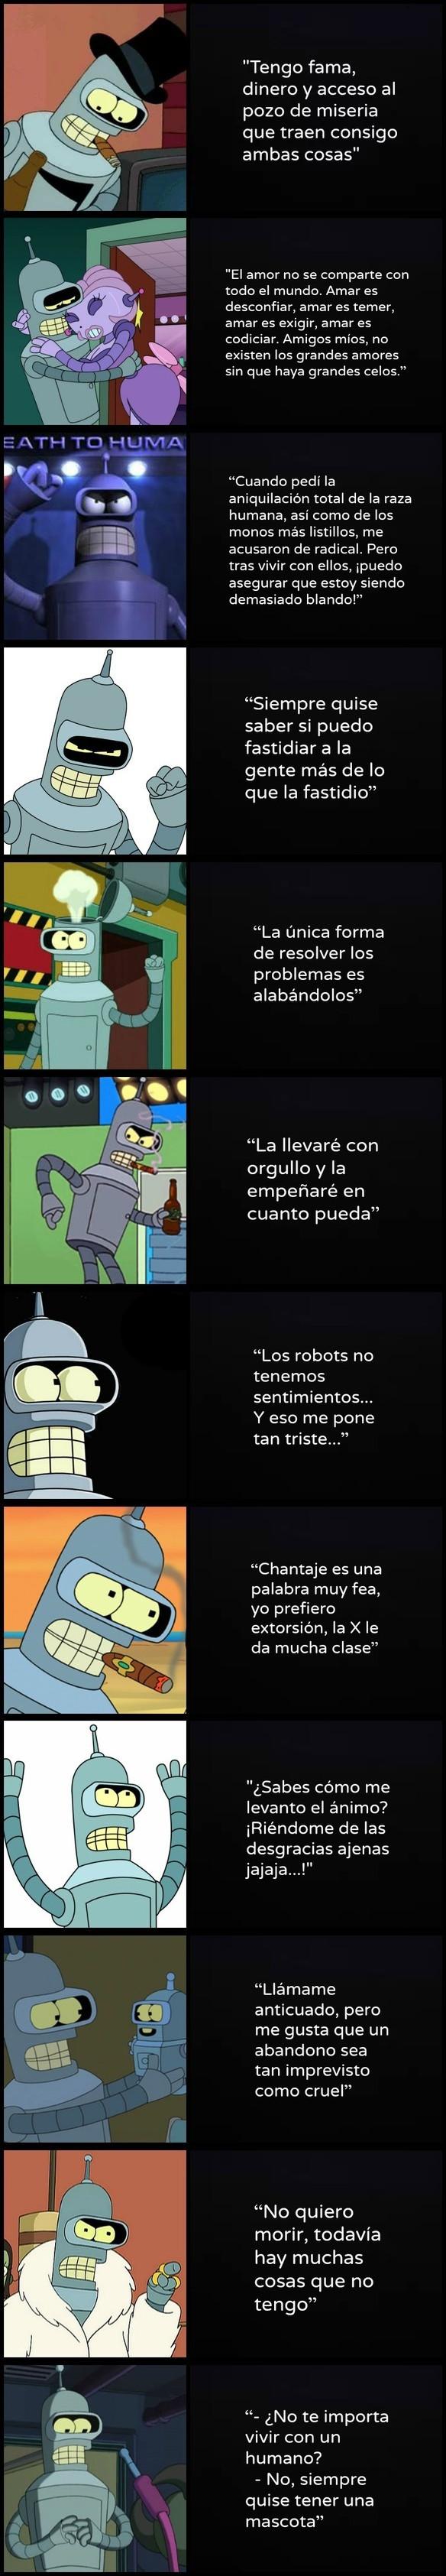 Otros - Bender, un modelo a seguir